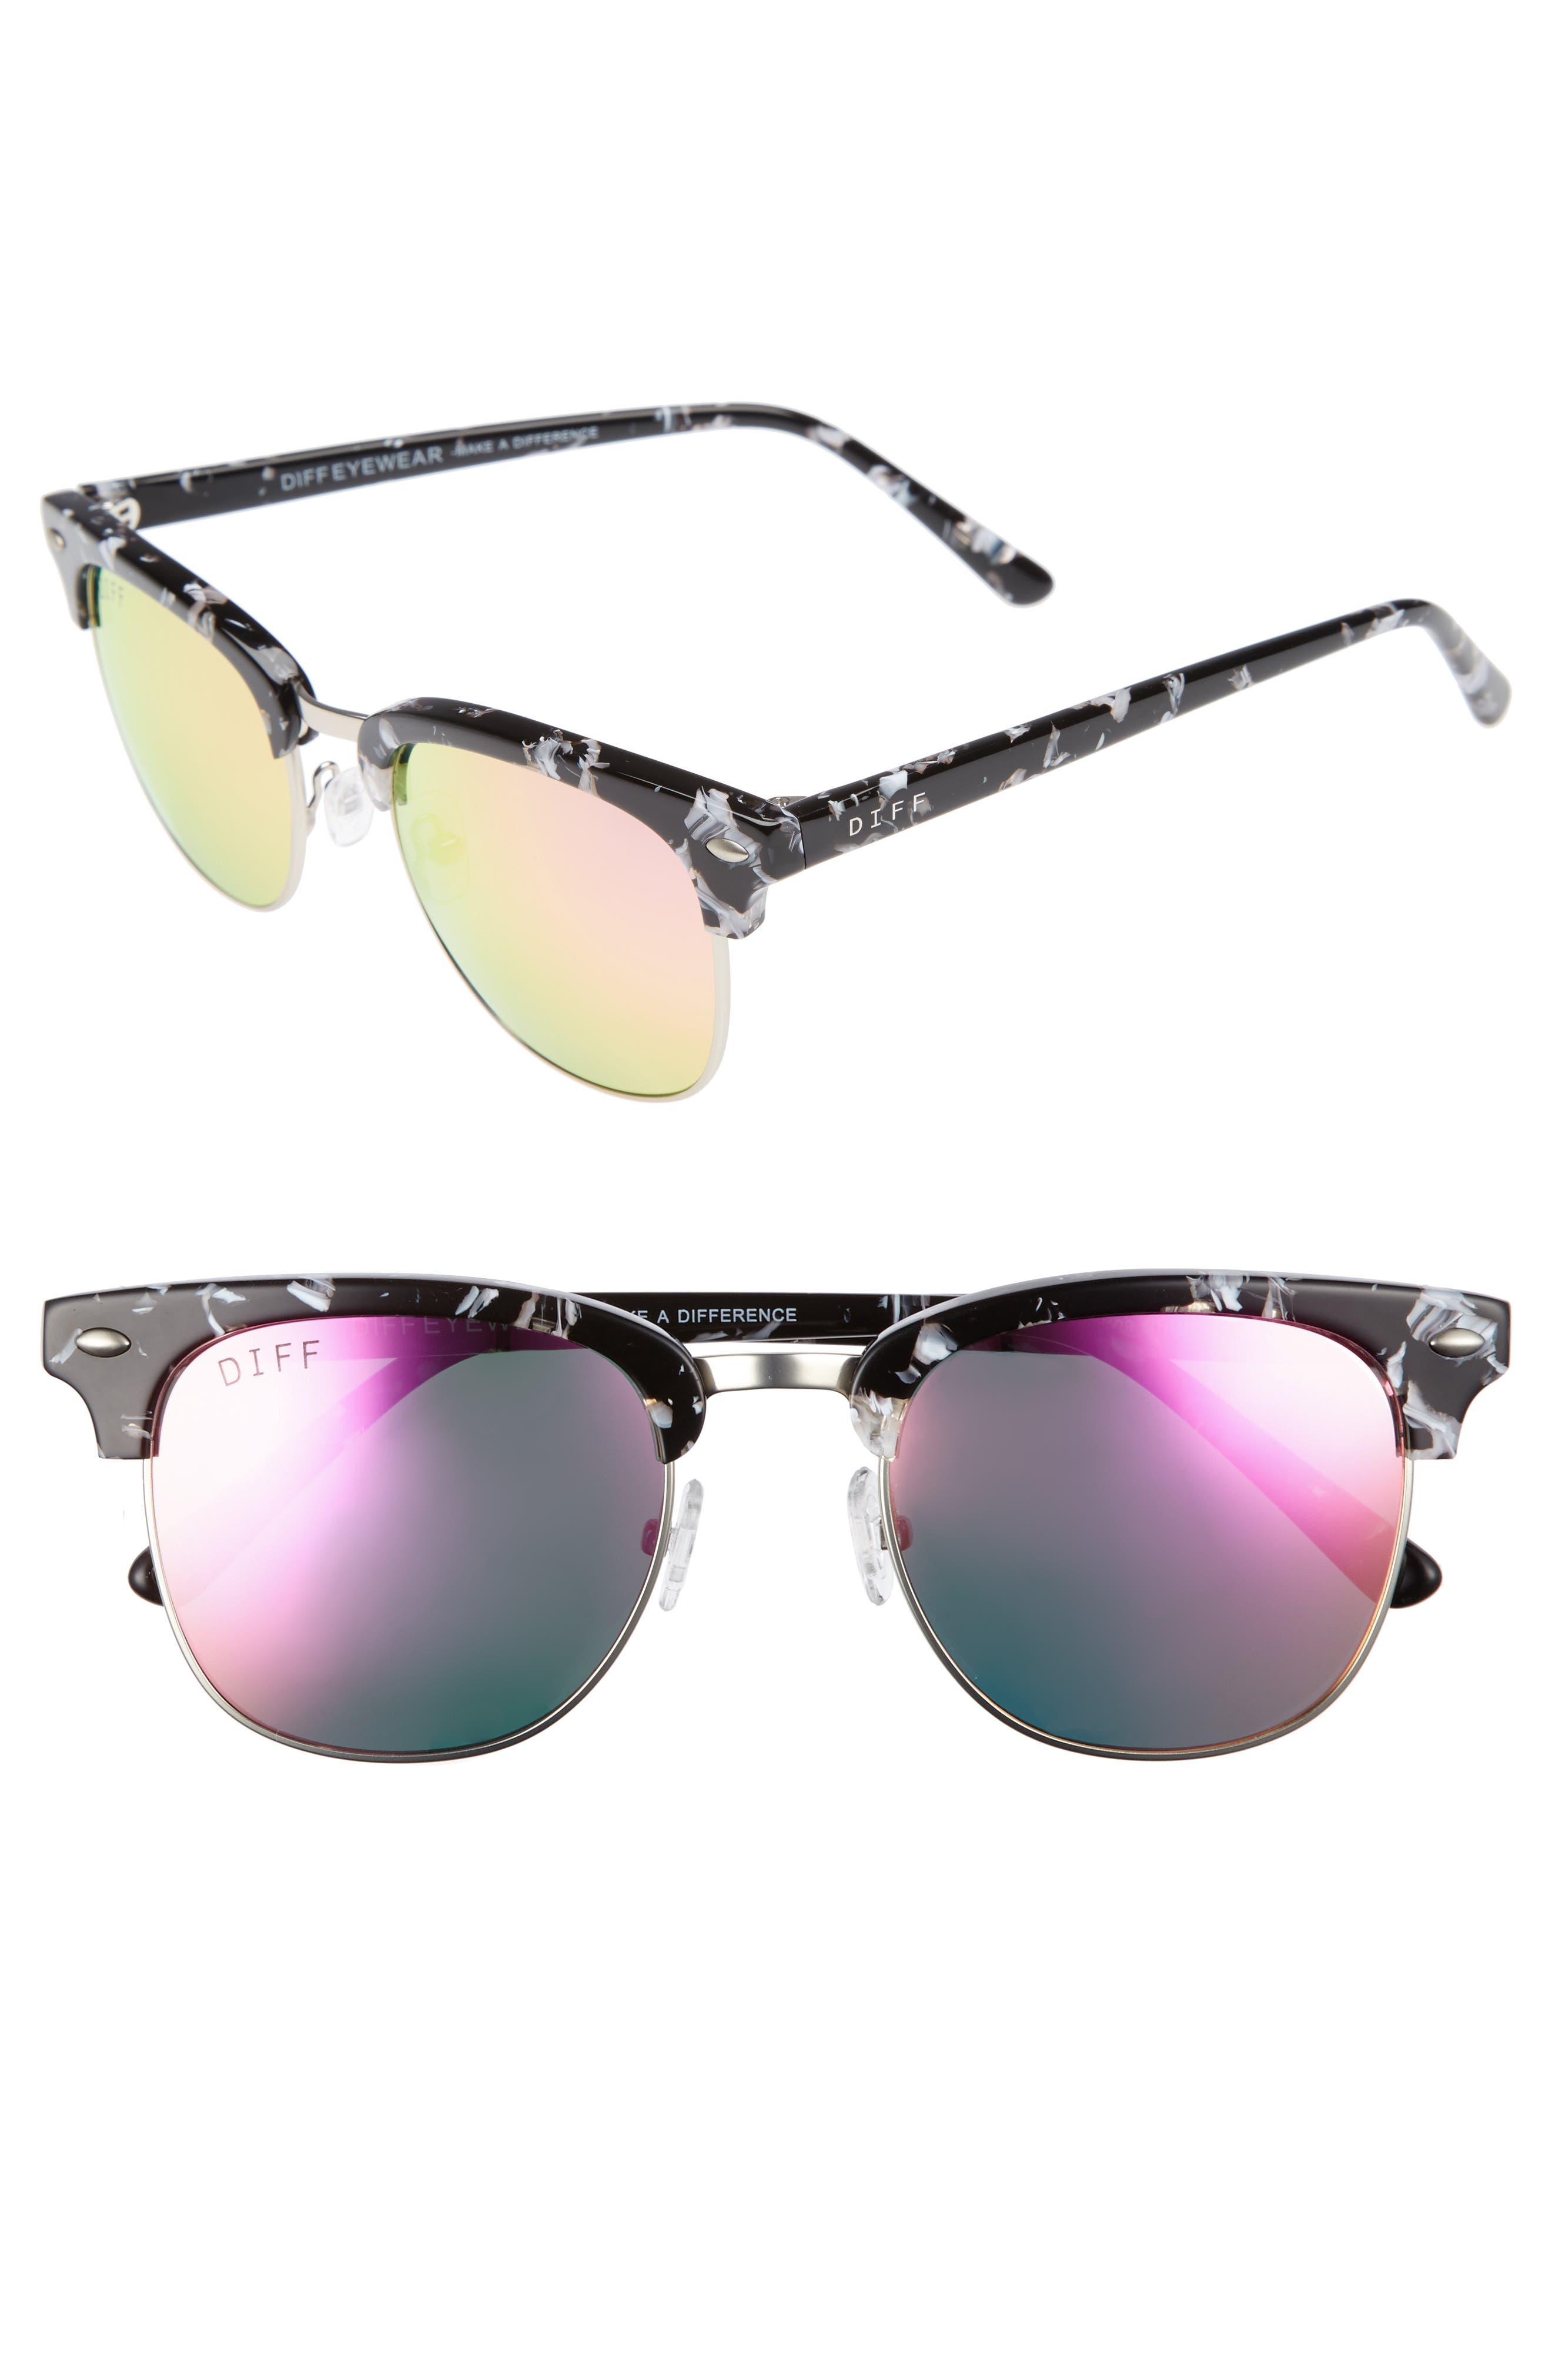 Main Image - DIFF Barry 51mm Polarized Retro Sunglasses